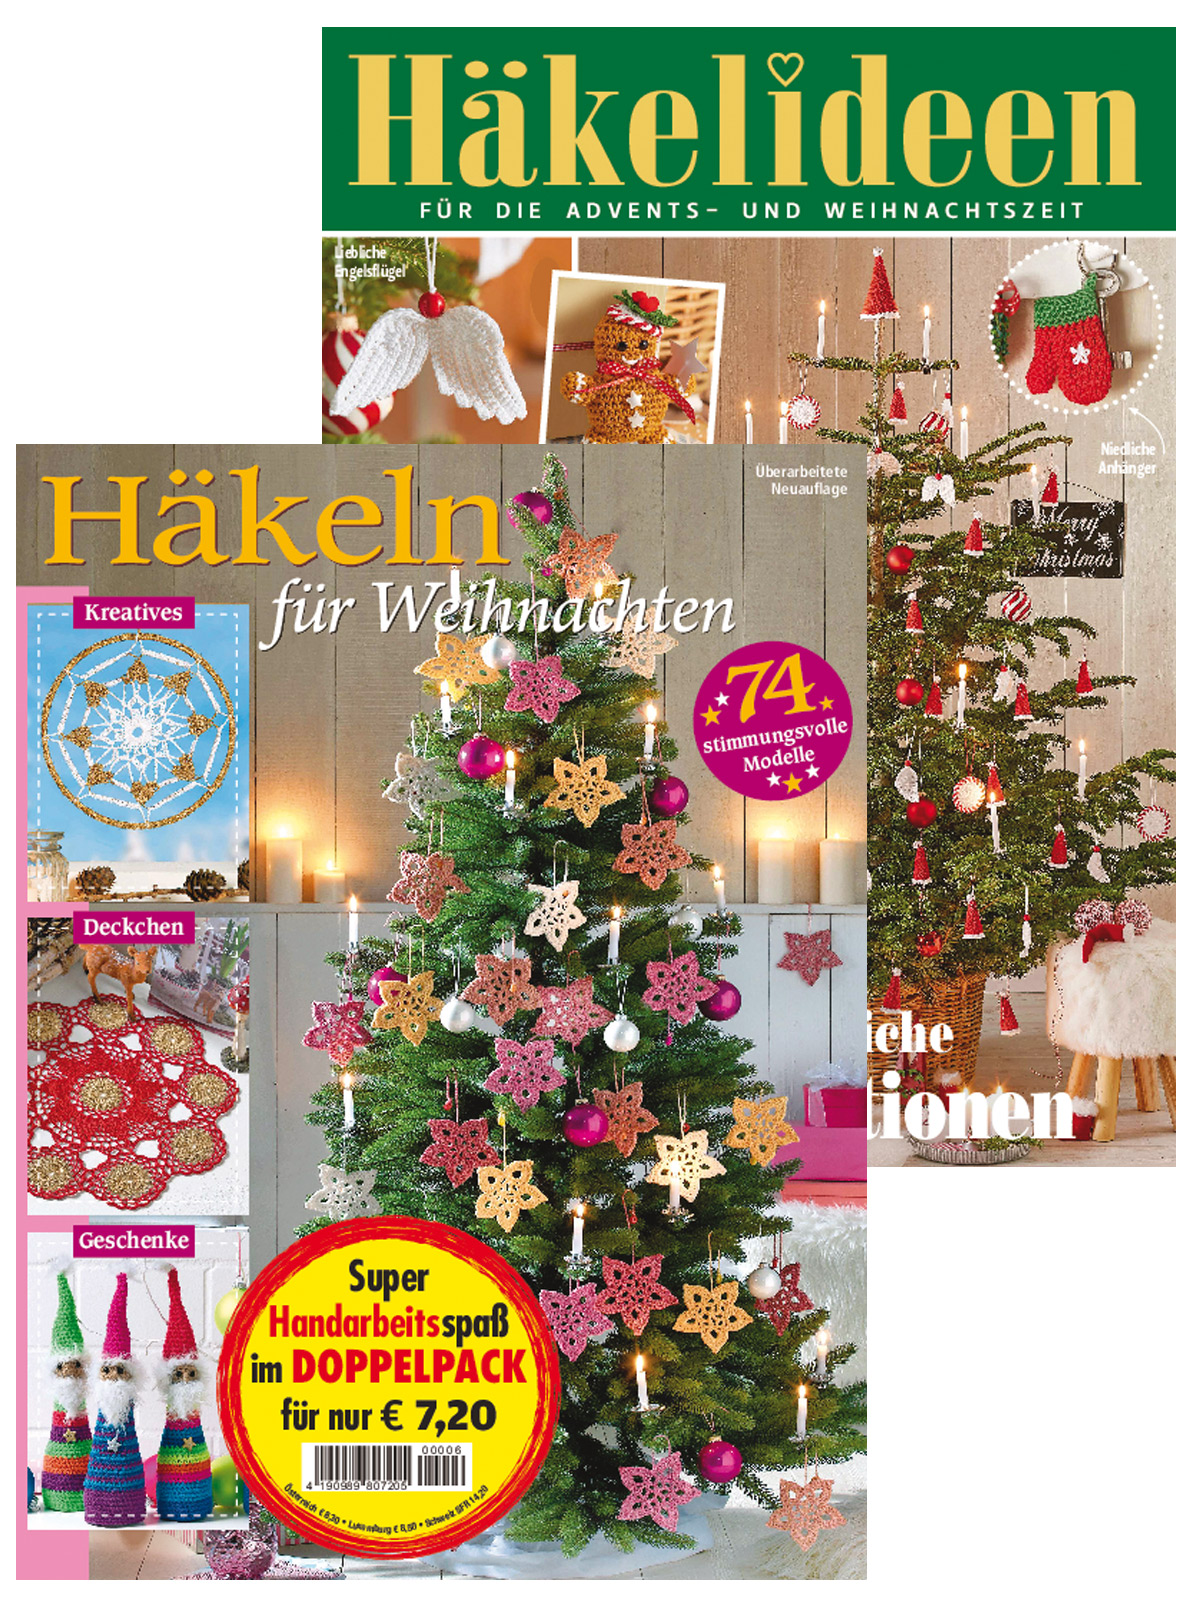 Zwei Zeitschriften: Häkeln Deko Whn. 220096 / A 516 + 220096/A 507